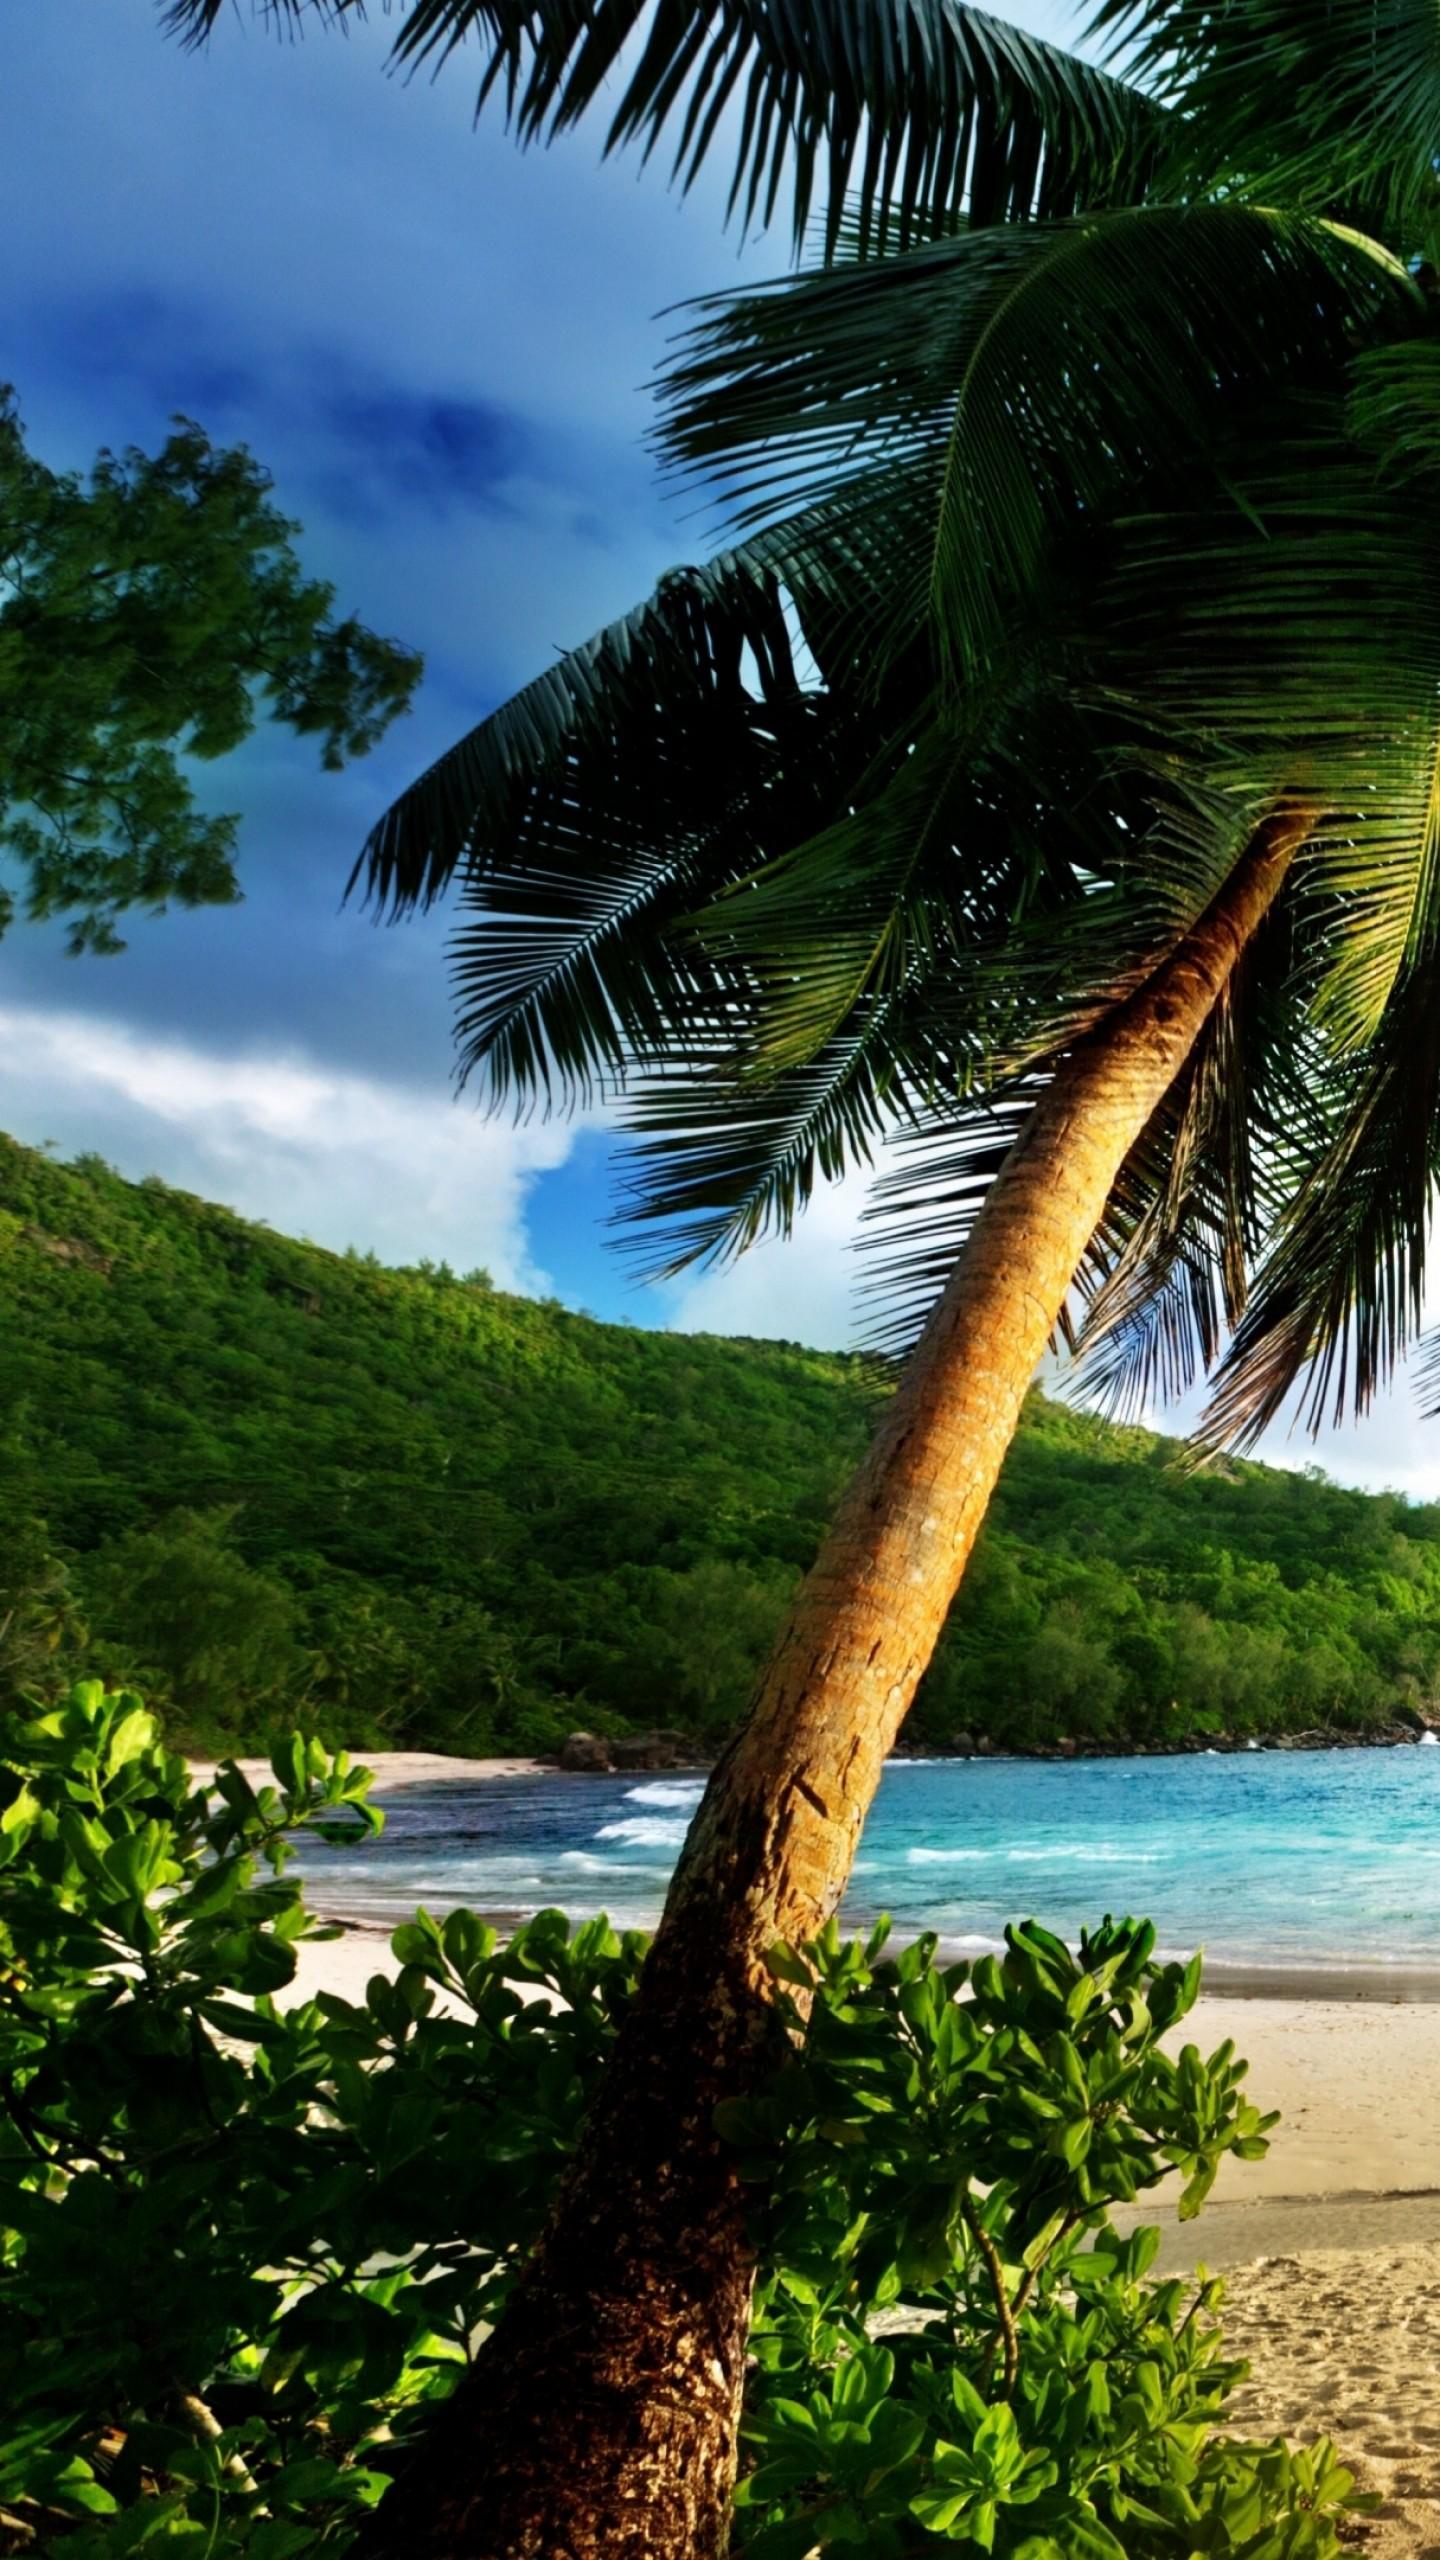 Wallpaper Thailand 5k 4k Wallpaper Ocean Shore Palms